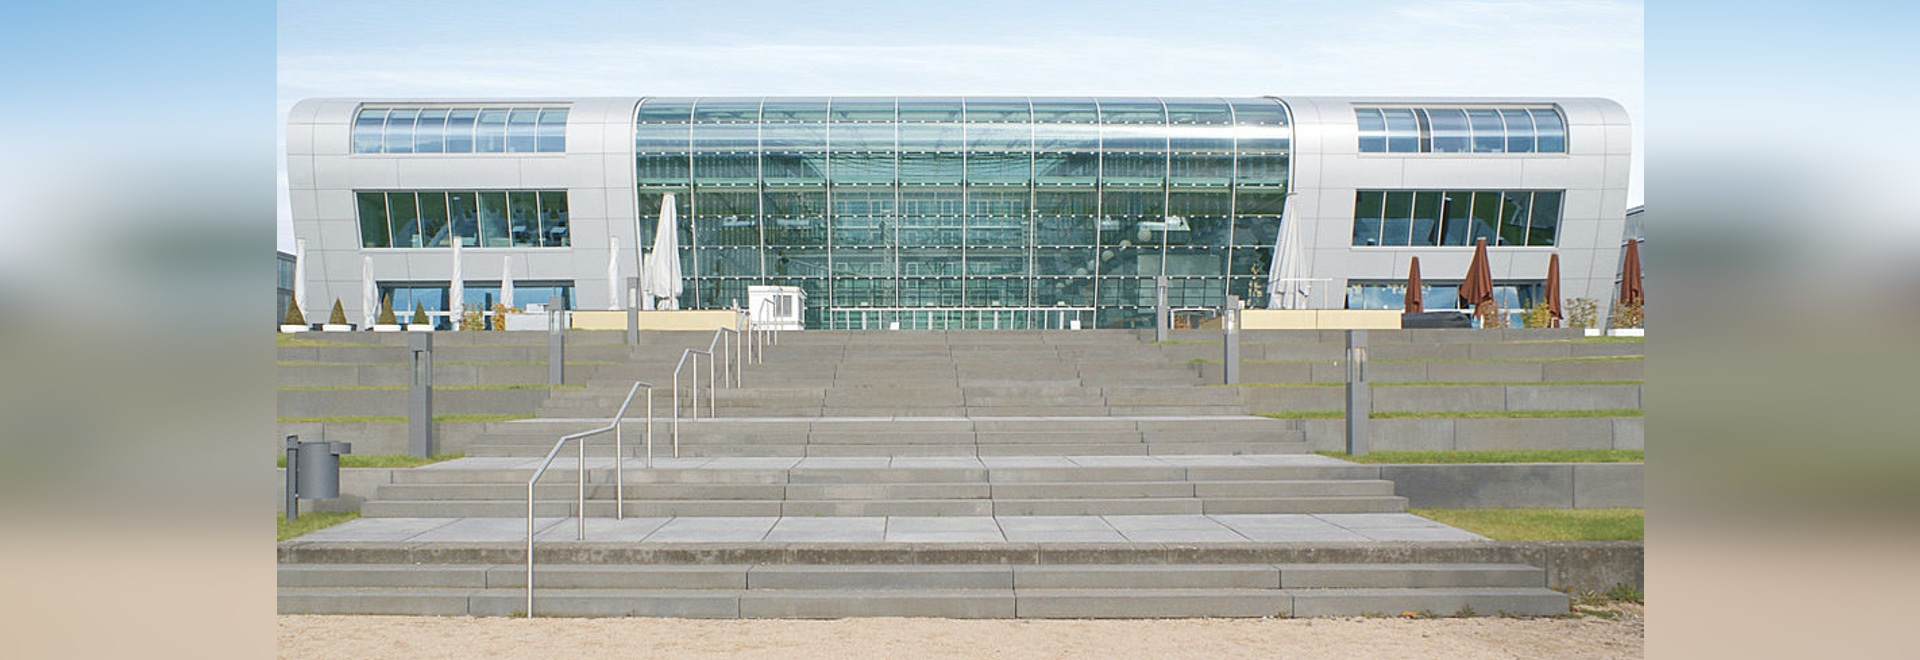 Luxury Hotel Kameha Grand Bonn - Futuristic architecture on the Rhine with Reynobond aluminium composite panels